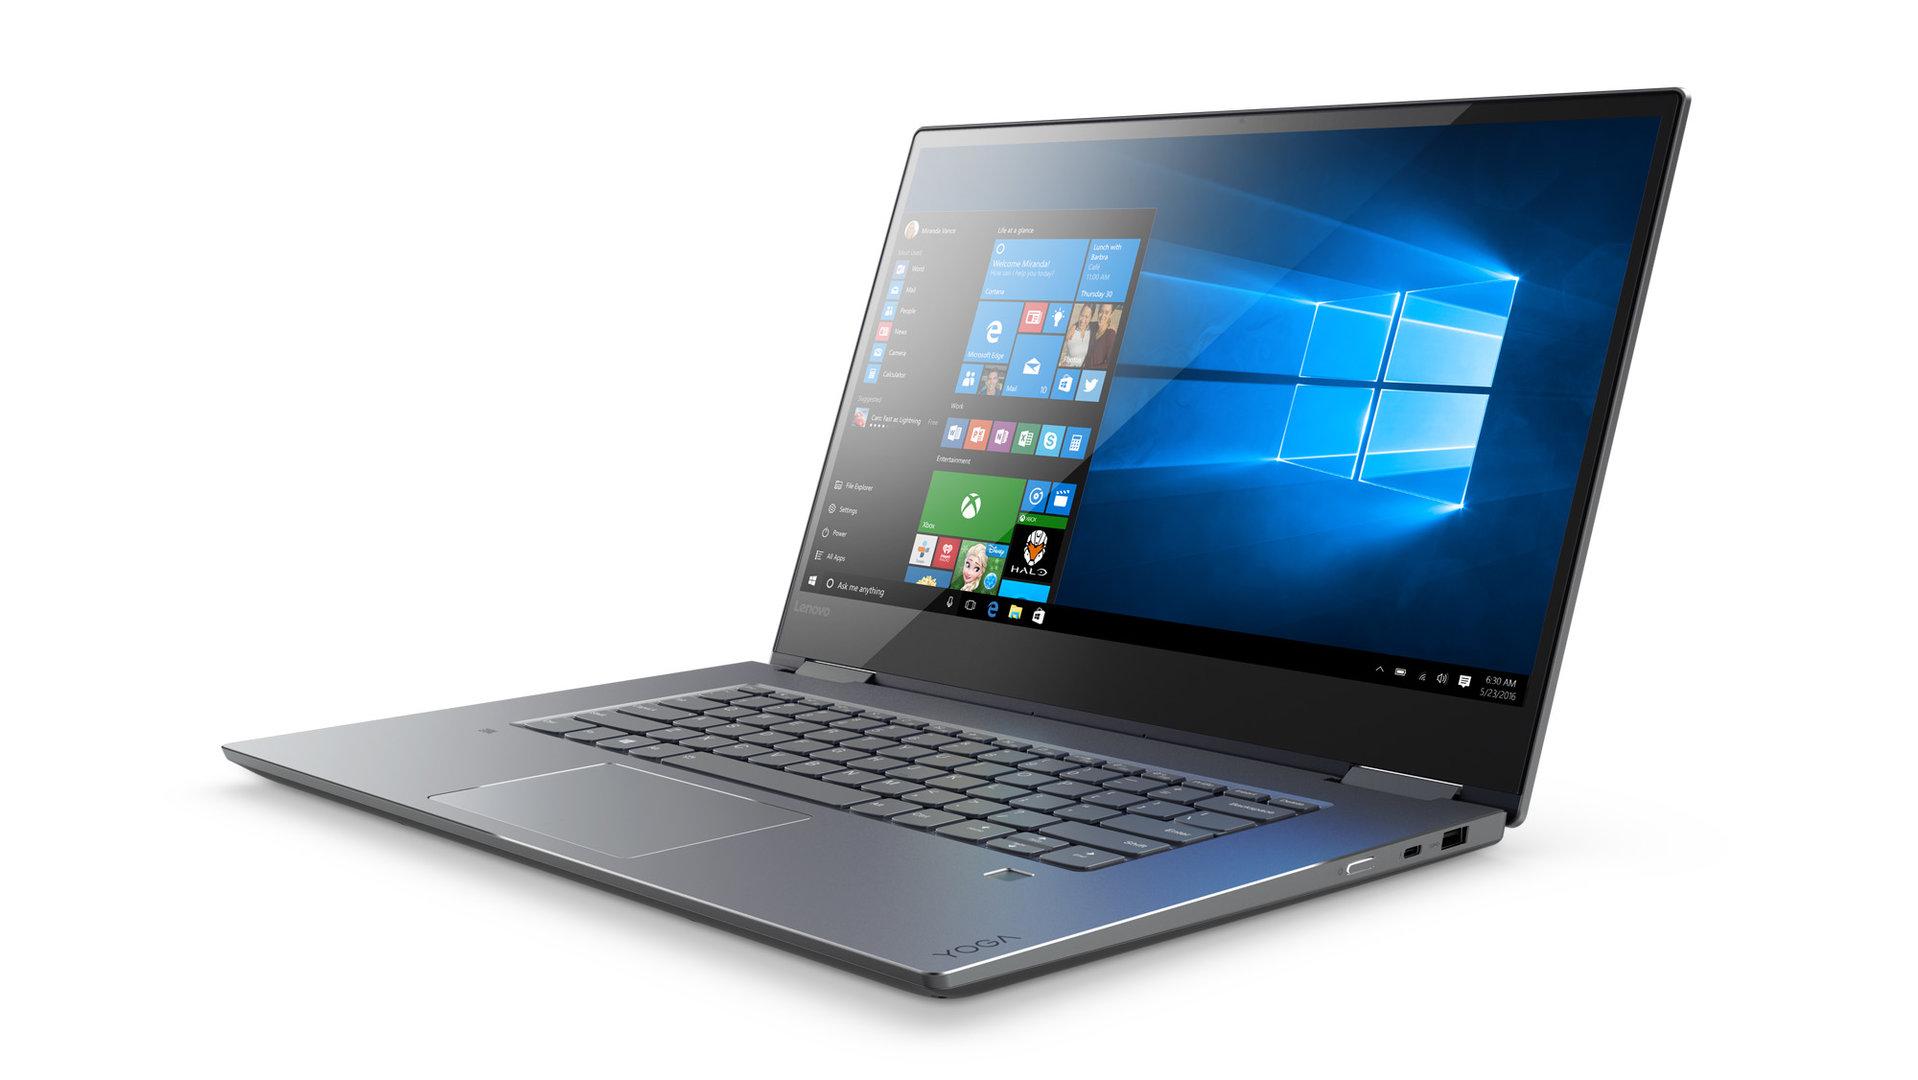 Lenovo Yoga 720 (15 Zoll) in Grau